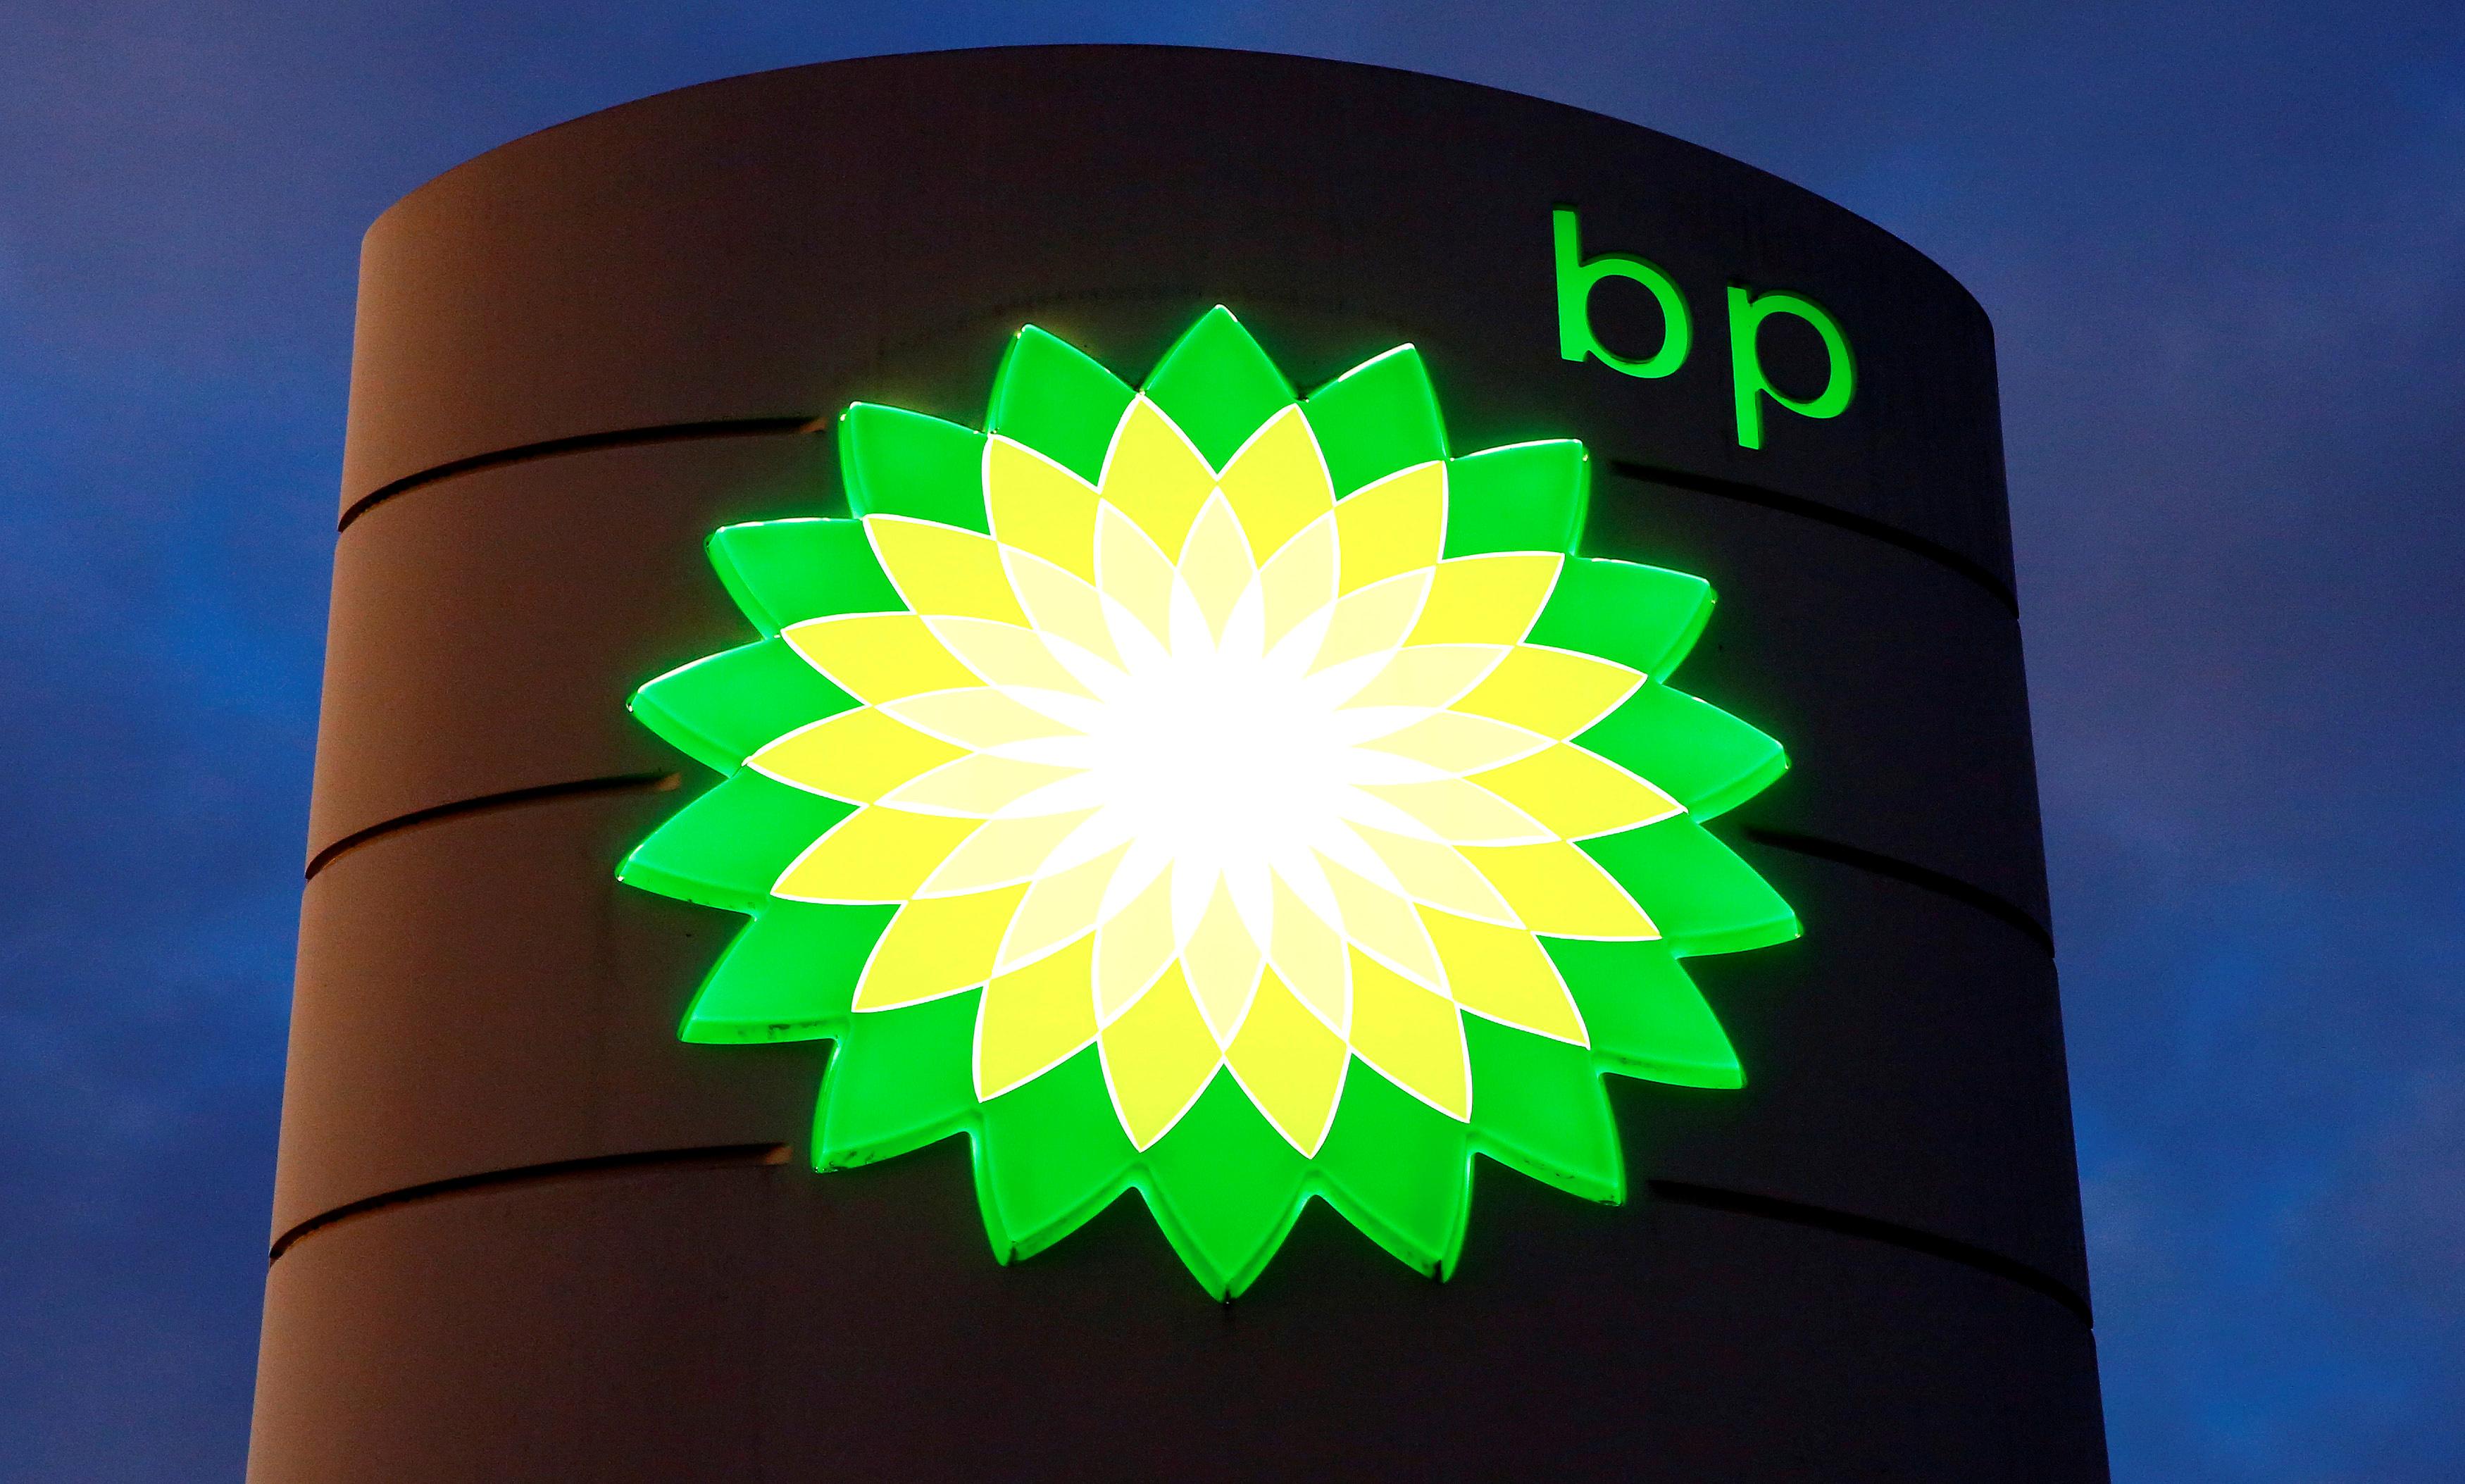 The logo of BP is seen at a petrol station in Kloten, Switzerland October 3, 2017. REUTERS/Arnd Wiegmann/File Photo